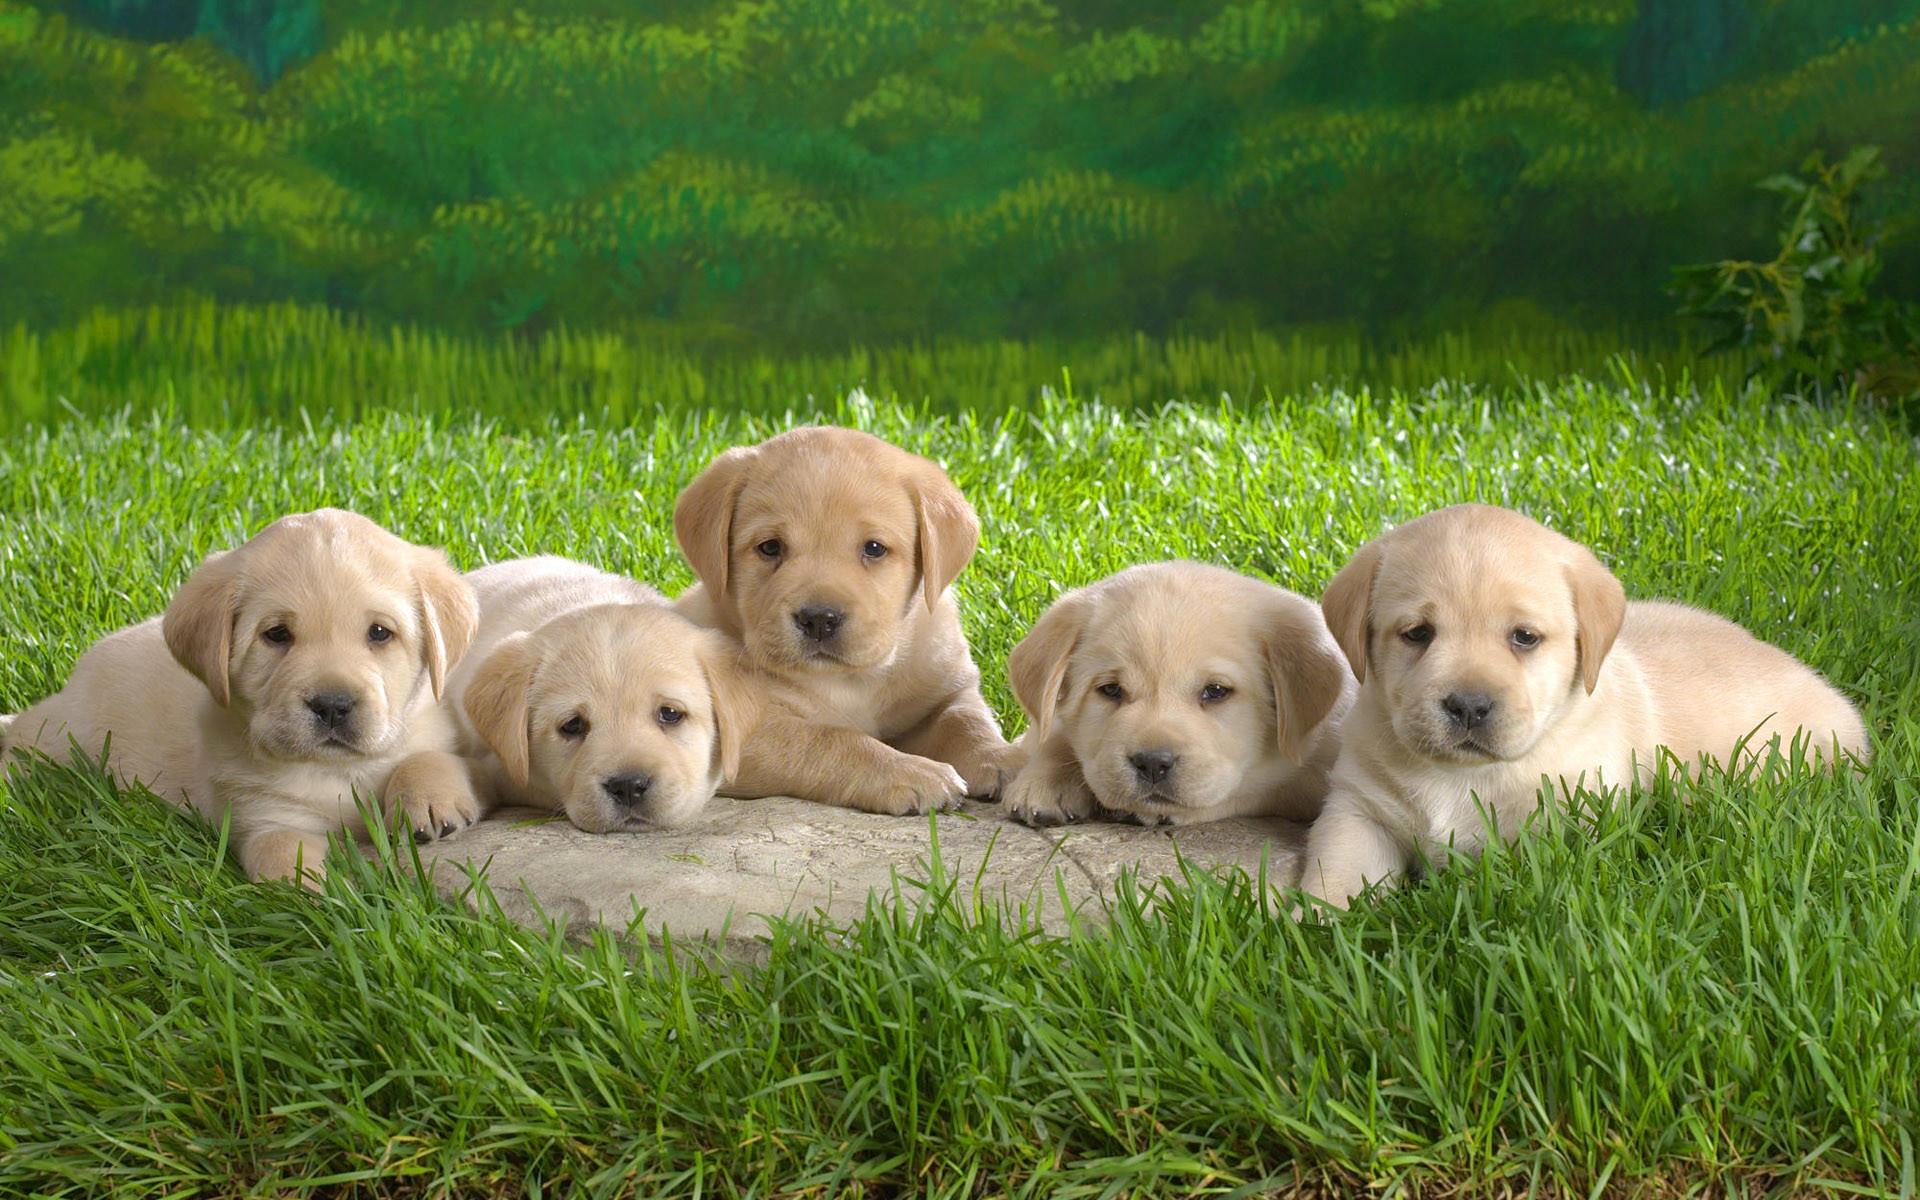 dog-wallpaper-desktop-107 – The Dog Wallpaper – Best The Dog Wallpaper